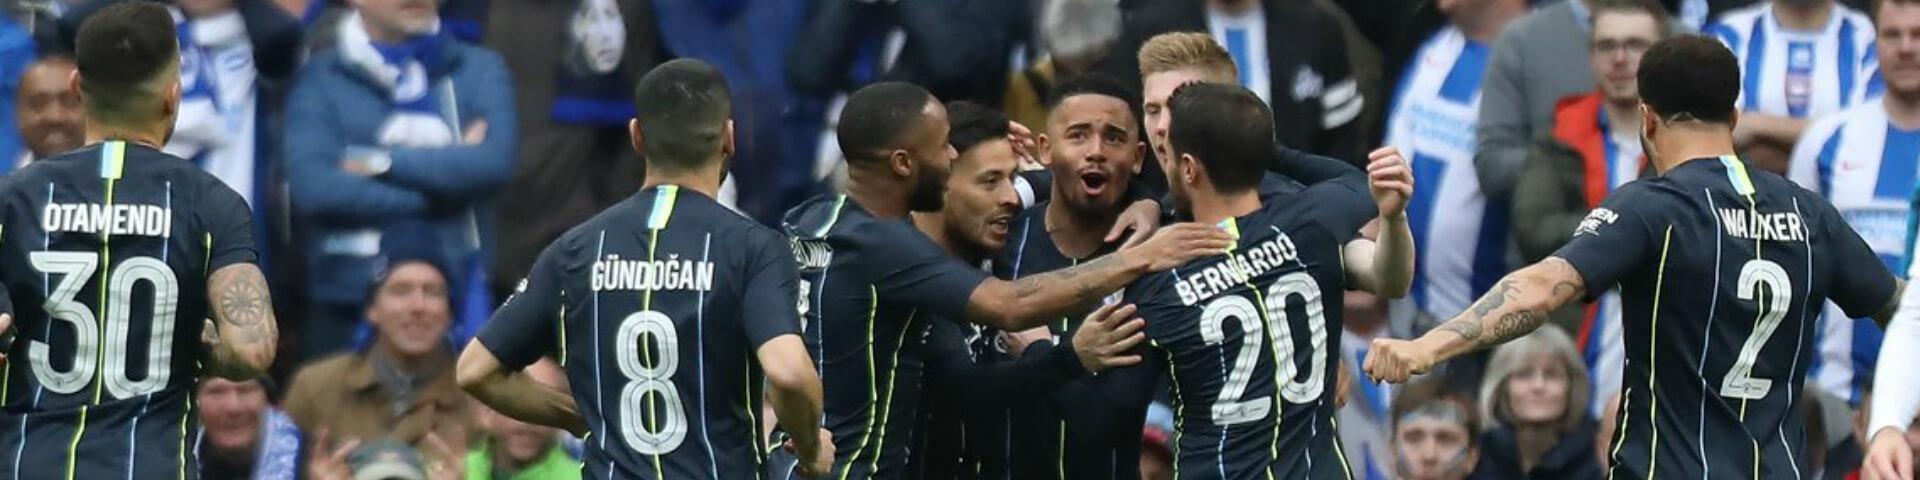 Букмекеры: «Манчестер Сити» обыграет «Тоттенхэм»